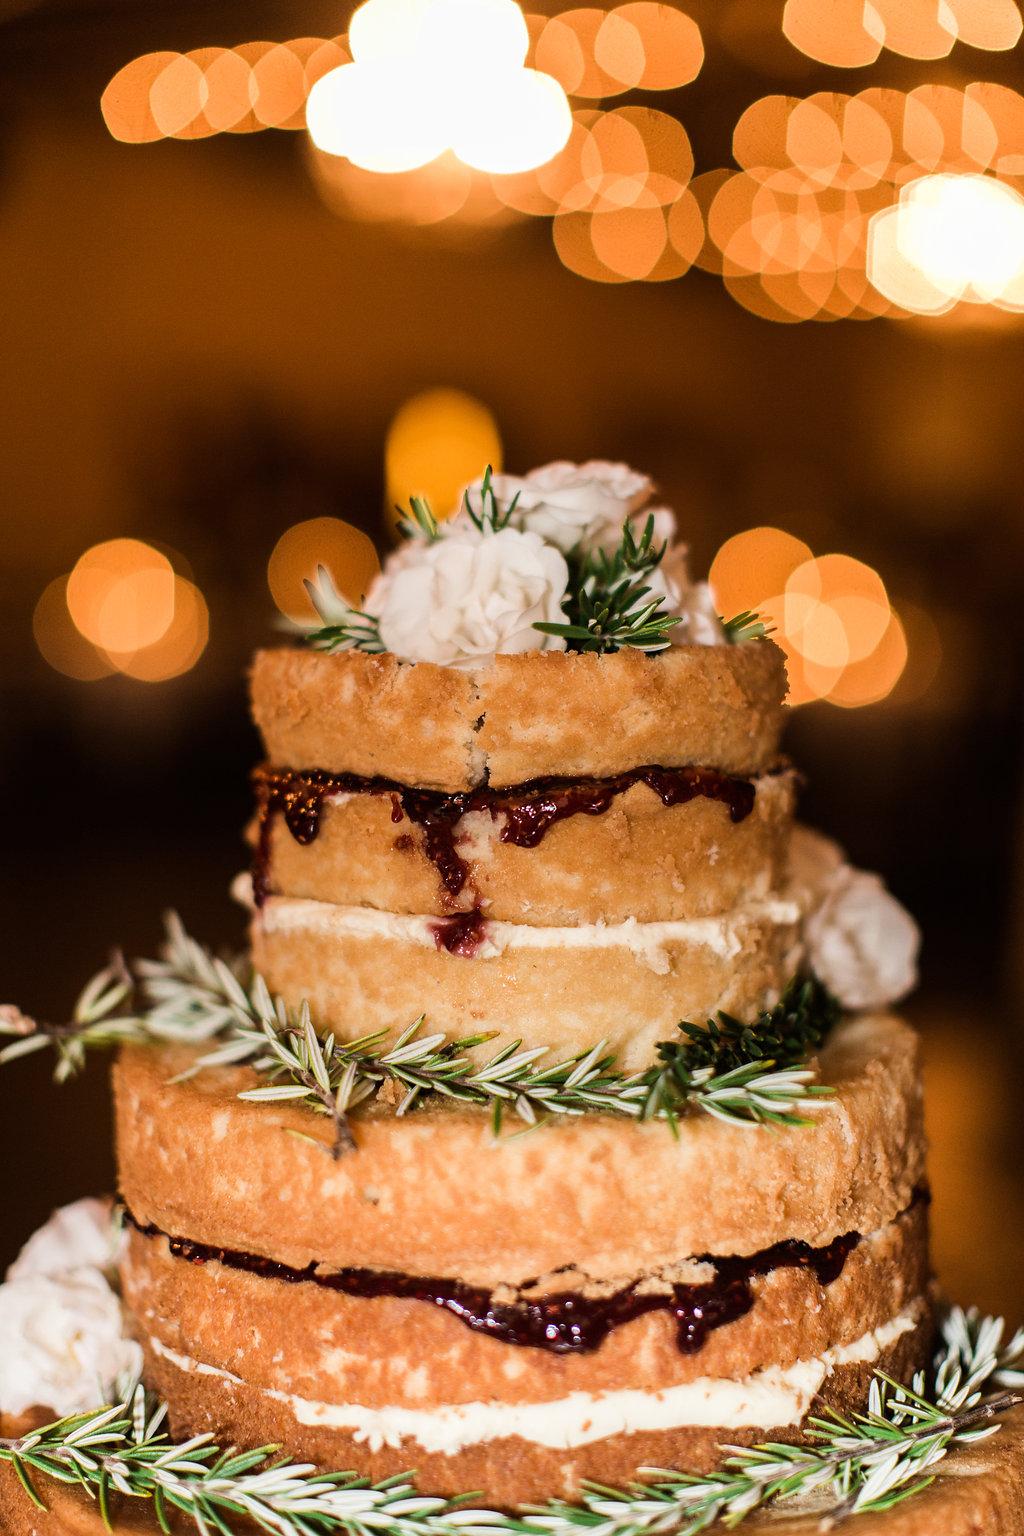 stacey-and-tj-wedding-apartment-b-photography-ivory-and-beau-bridal-boutique-savannah-wedding-dresses-daughters-of-simone-lu-boho-bride-boho-wedding-savannah-boho-wedding-savannah-weddings-savannah-bridal-gowns-savannah-wedding-45.jpg